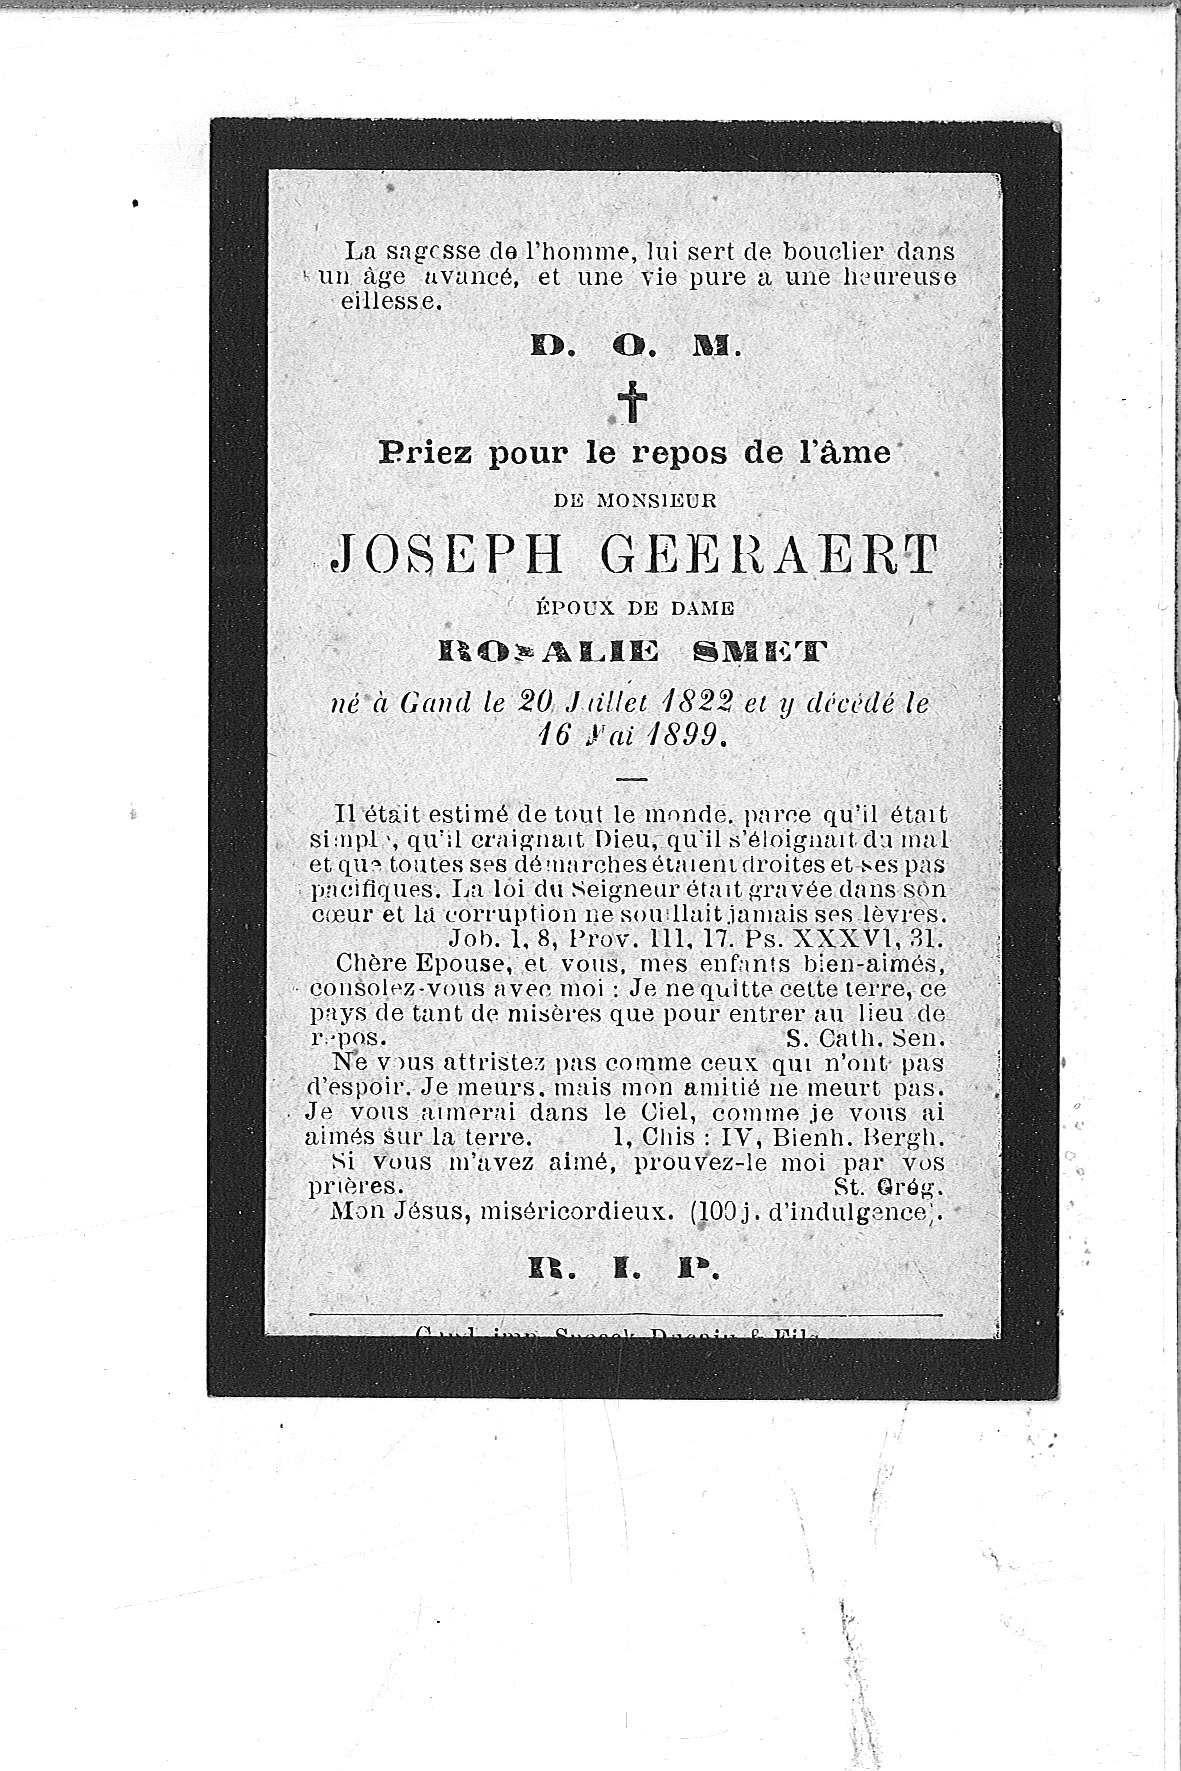 Joseph(1899)20130821155154_00013.jpg